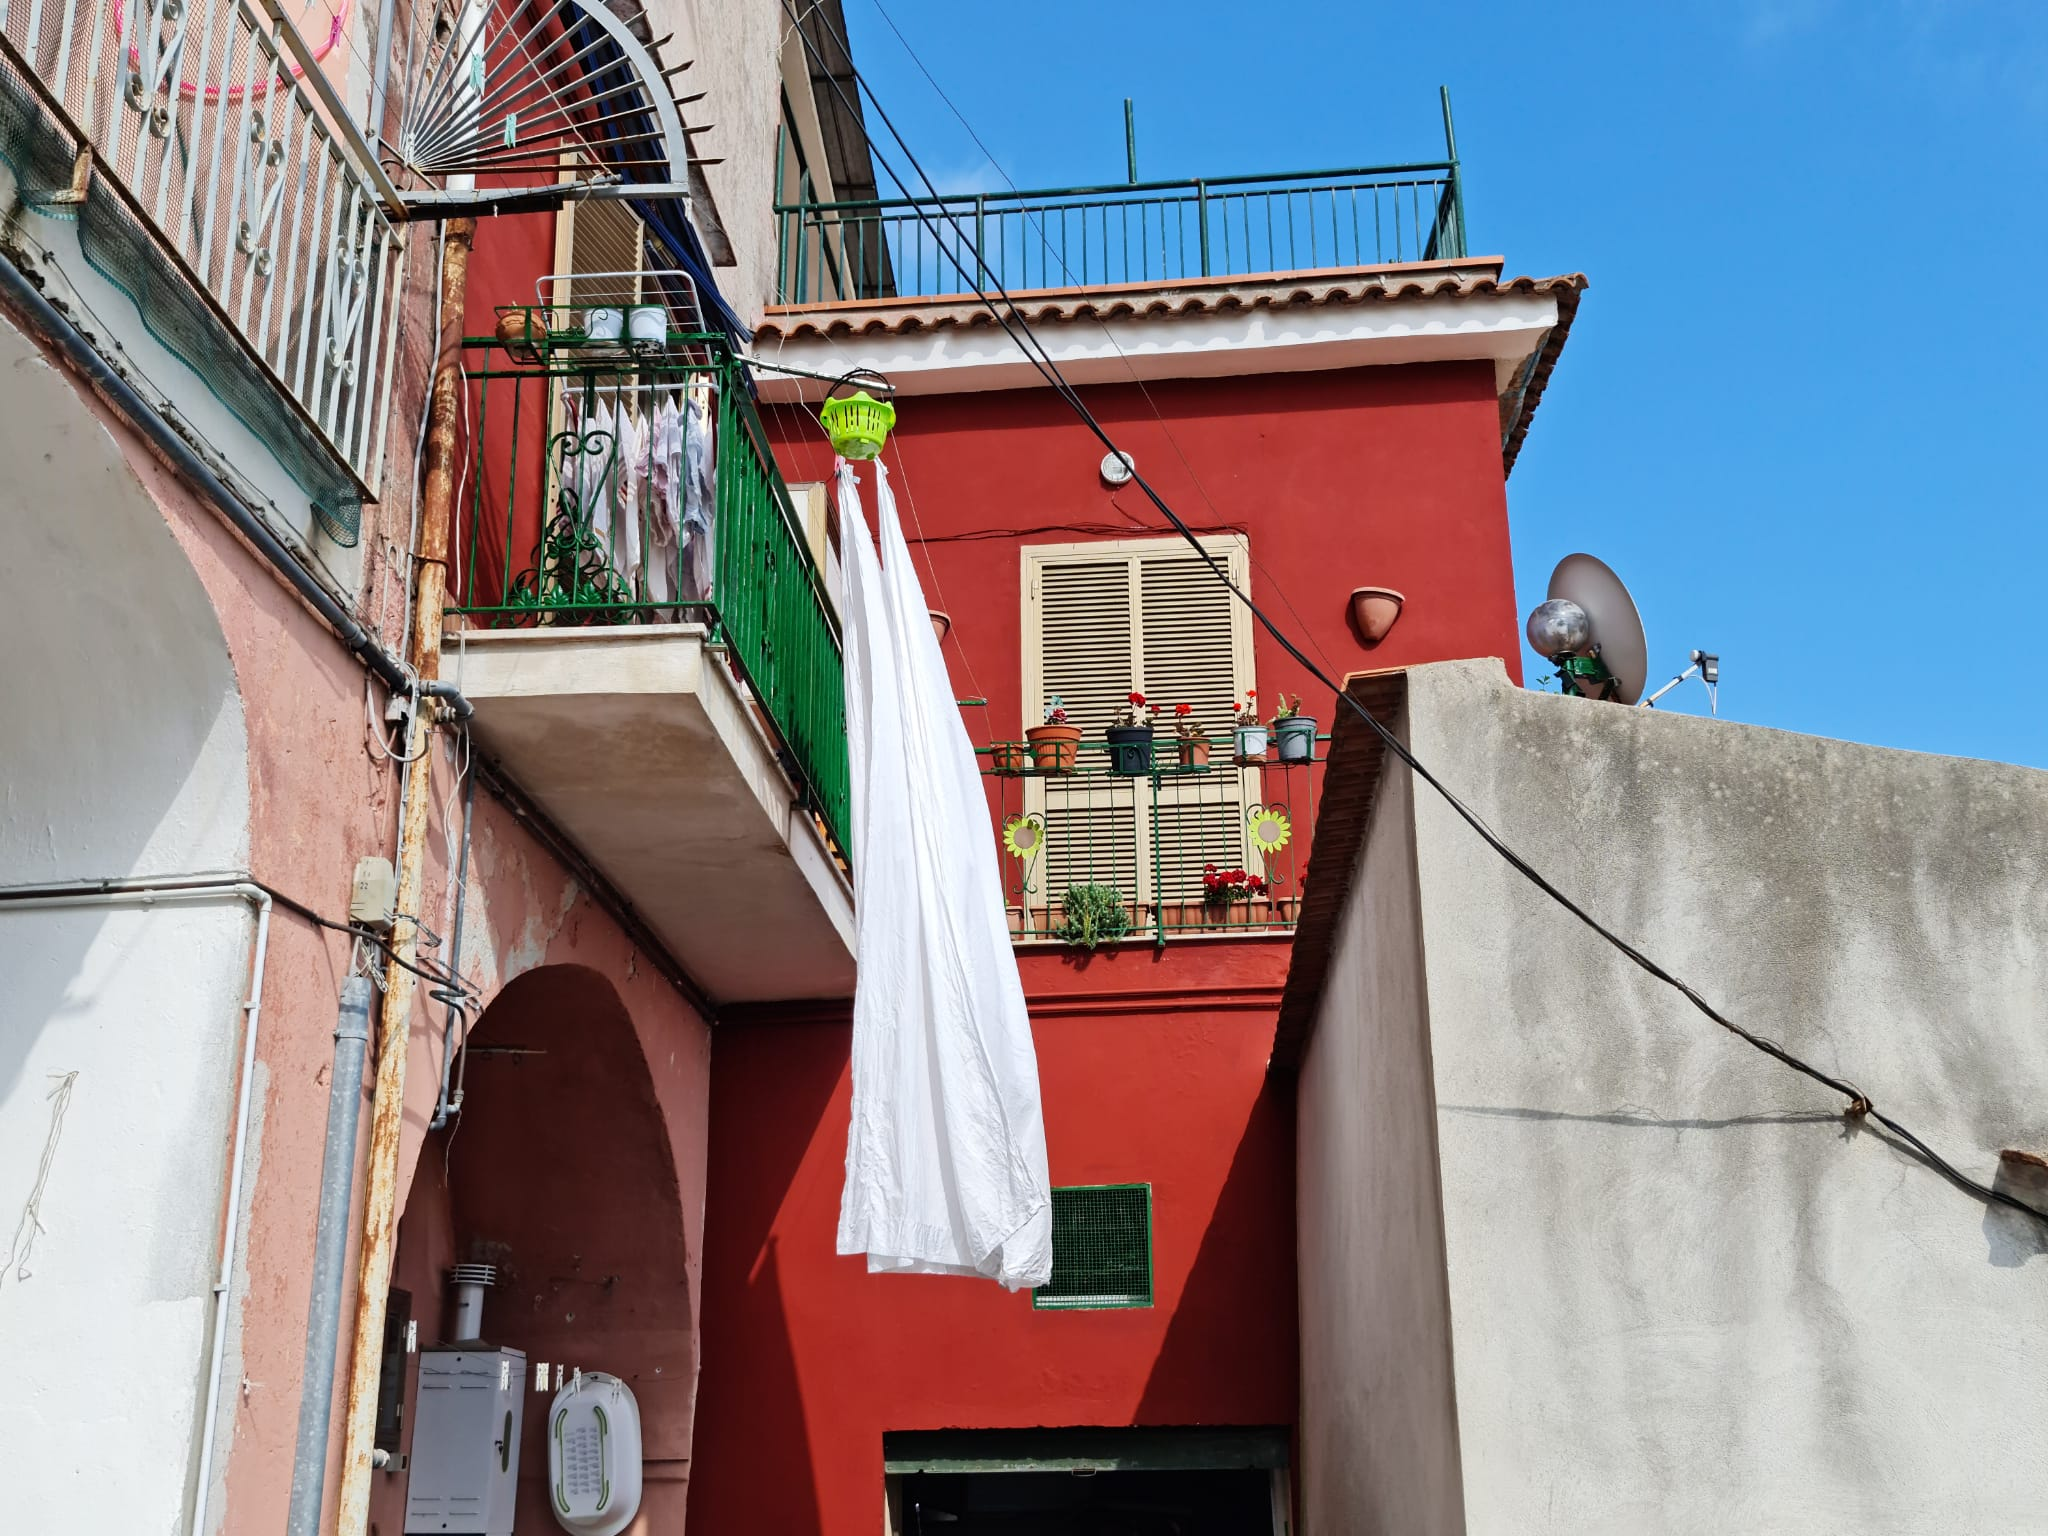 Sessa A. – Loc. Sant'Agata